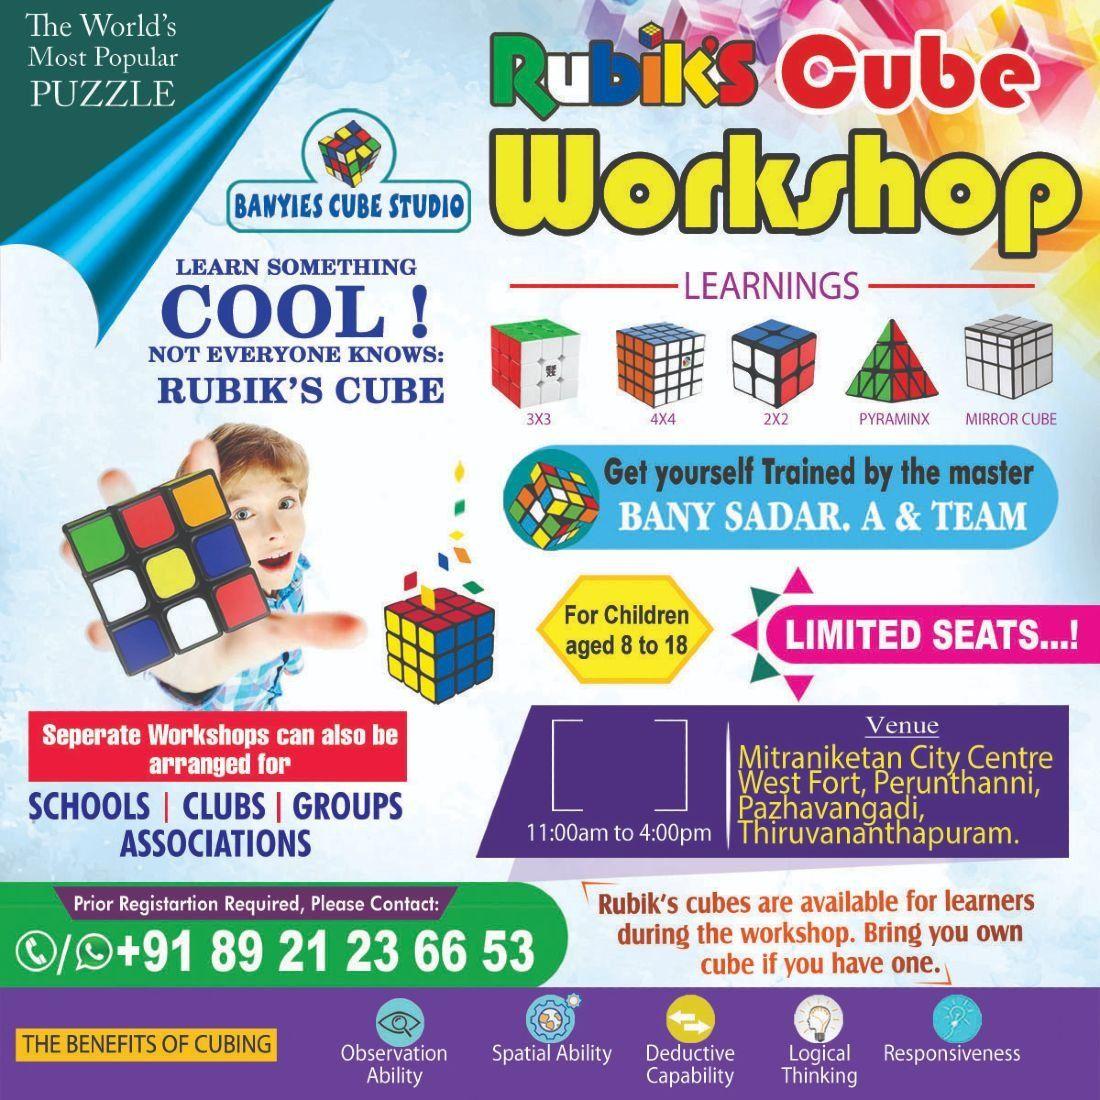 Rubiks cube workshop